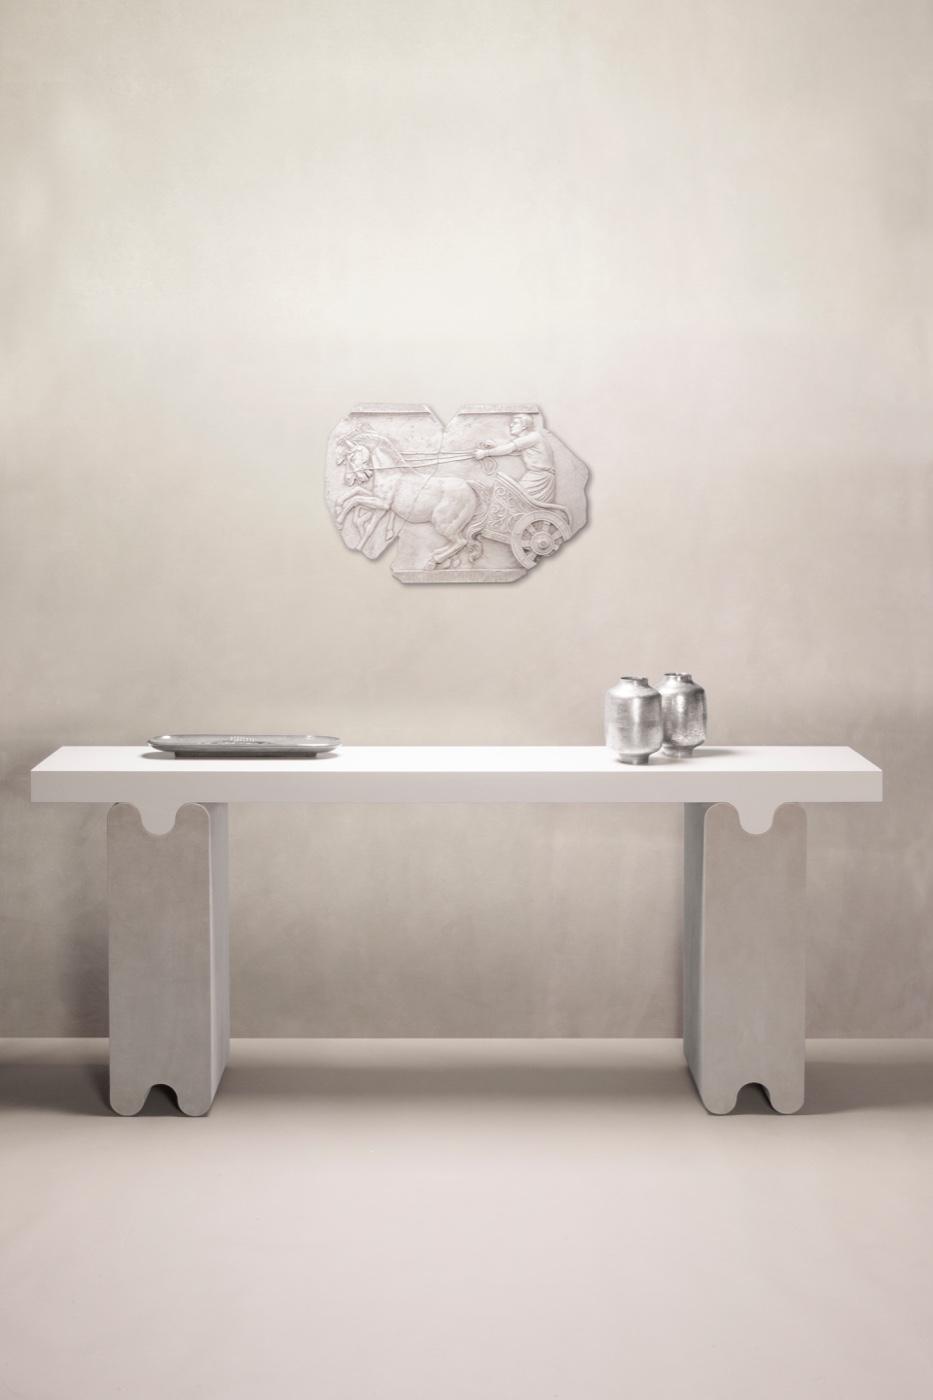 Sculpturale Meubels-Image-8